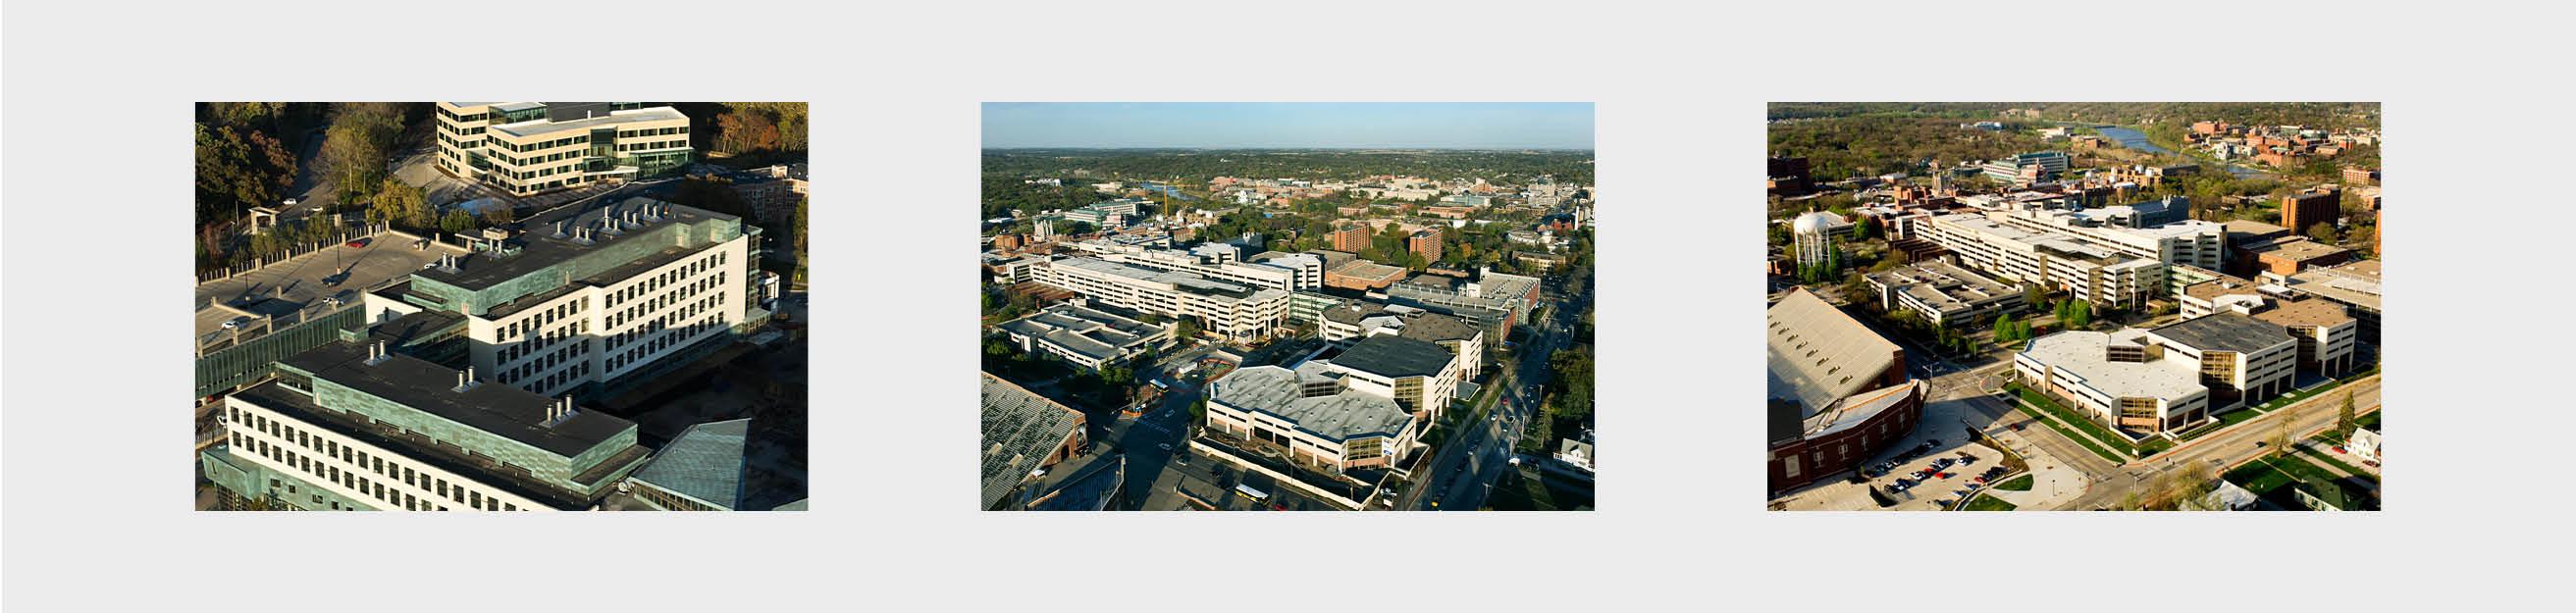 University of Iowa Health Care images